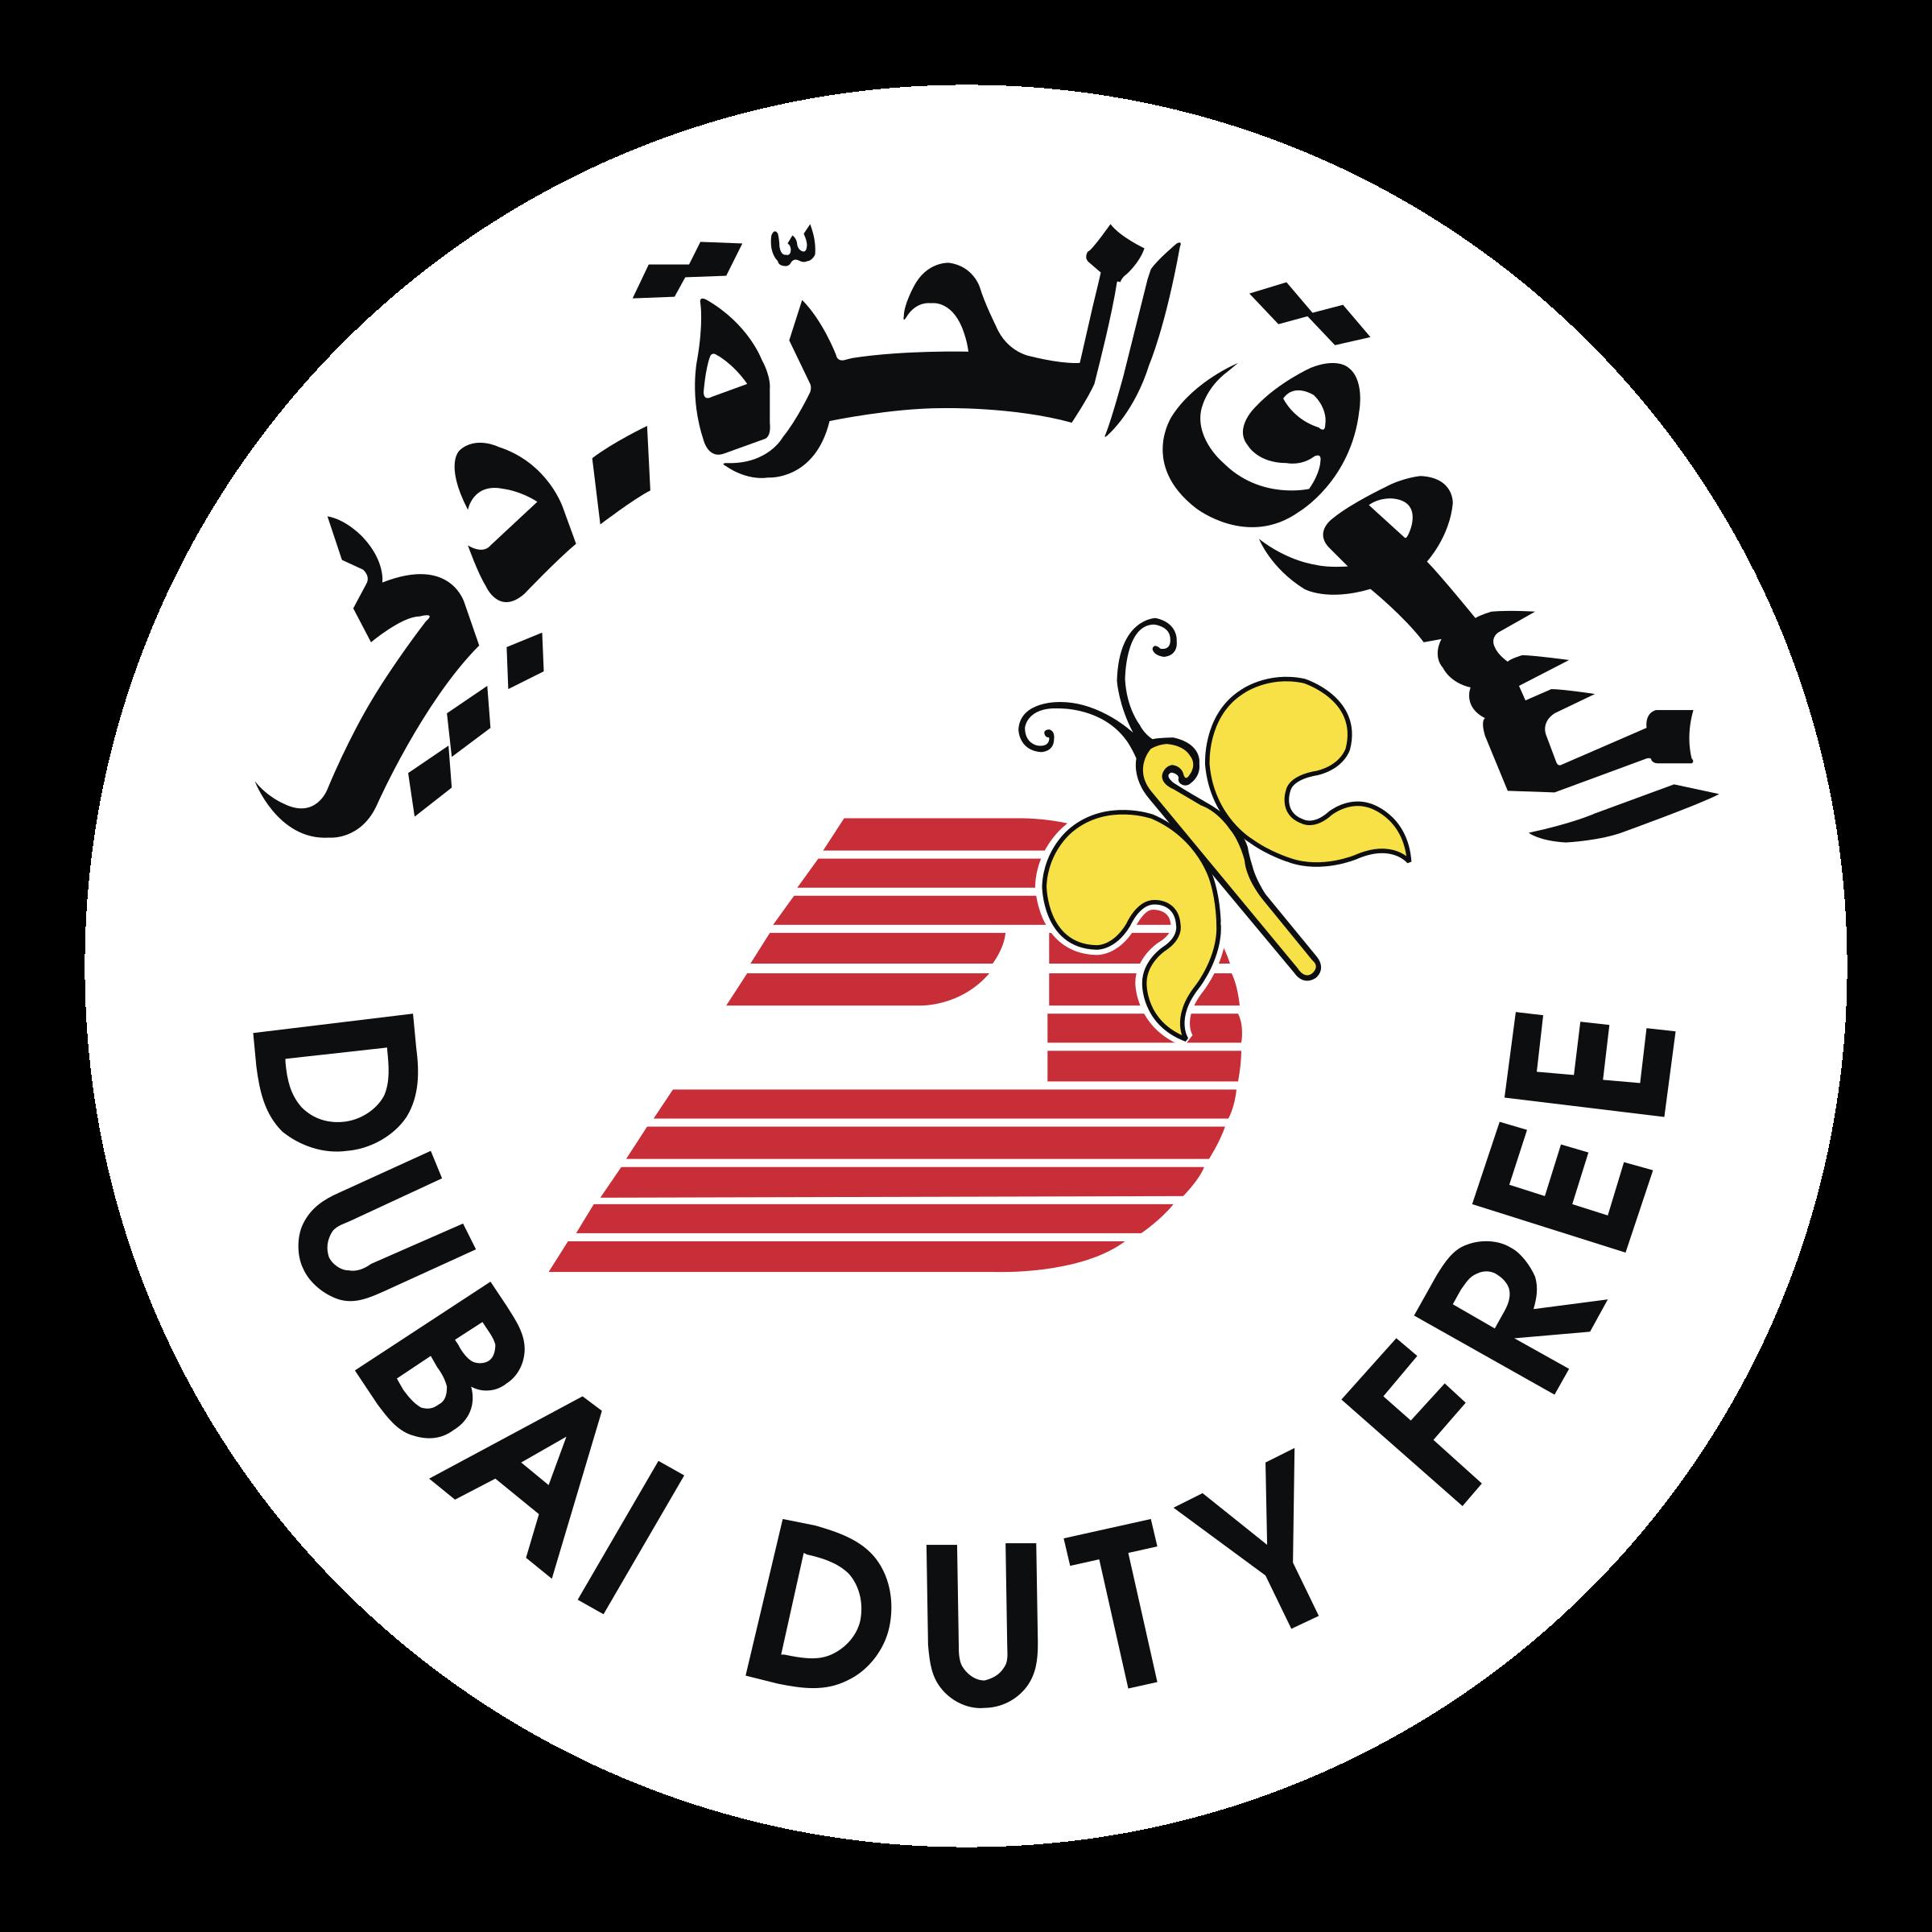 dubai duty free logo png transparent svg vector freebie supply dubai duty free logo png transparent